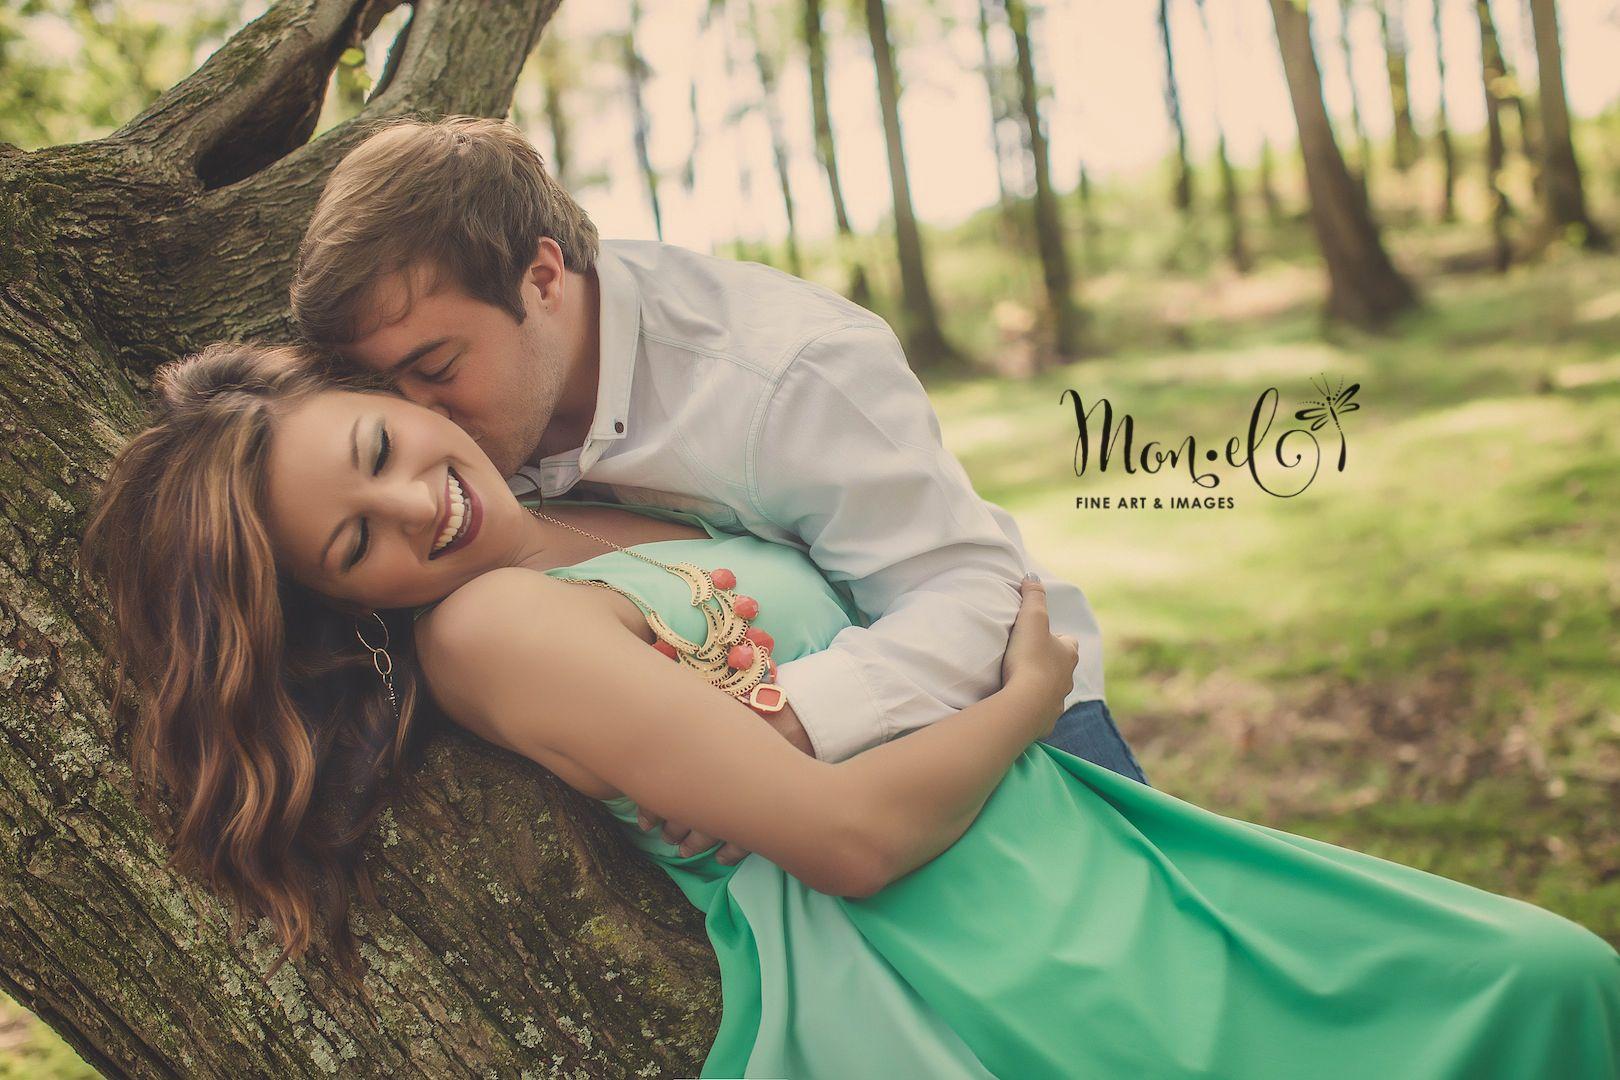 North Alabama portrait / wedding photographer Monica Dooley of Mon-el fine art & images, llc.